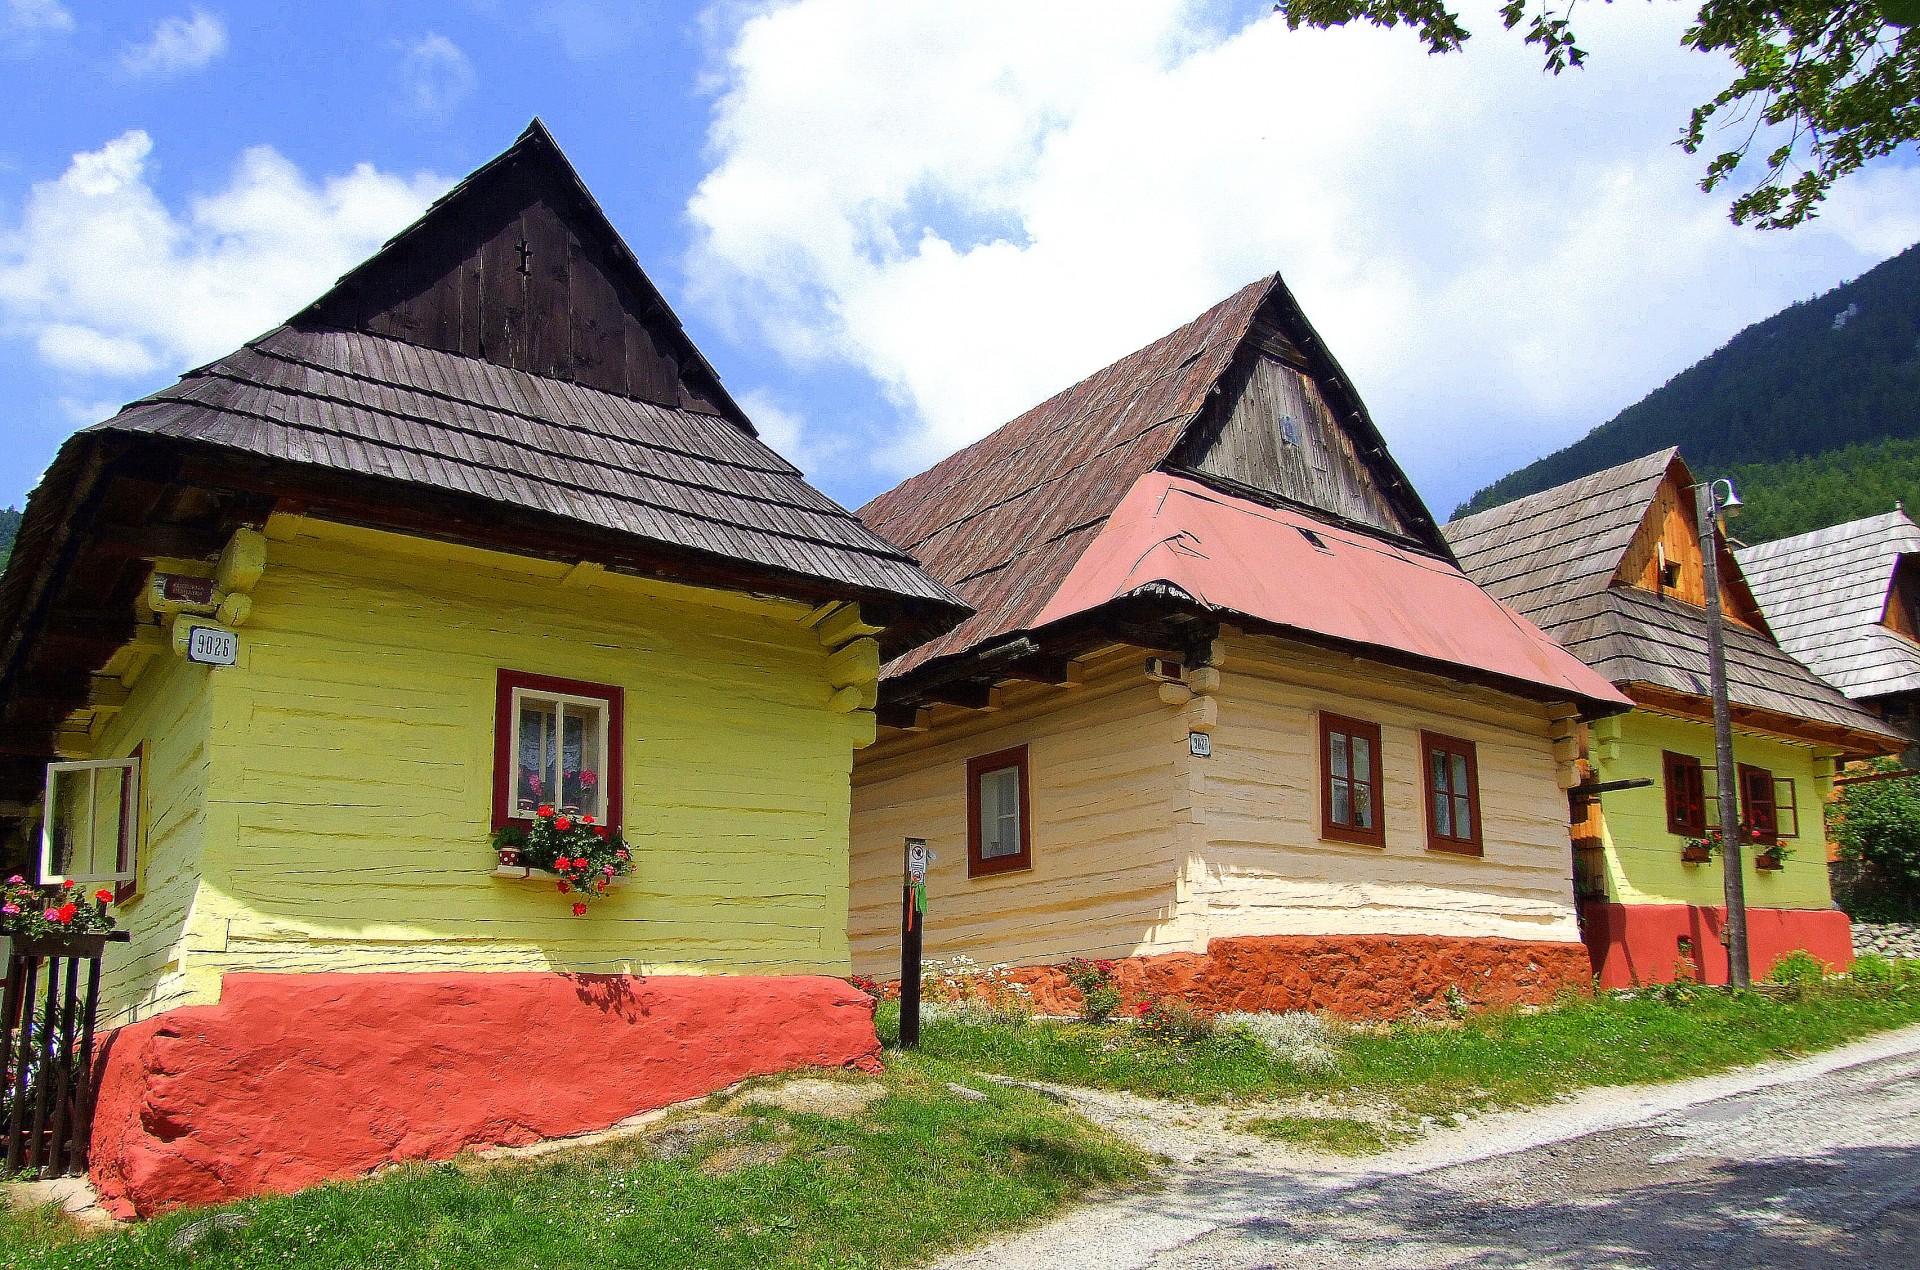 כפר ויקולינק